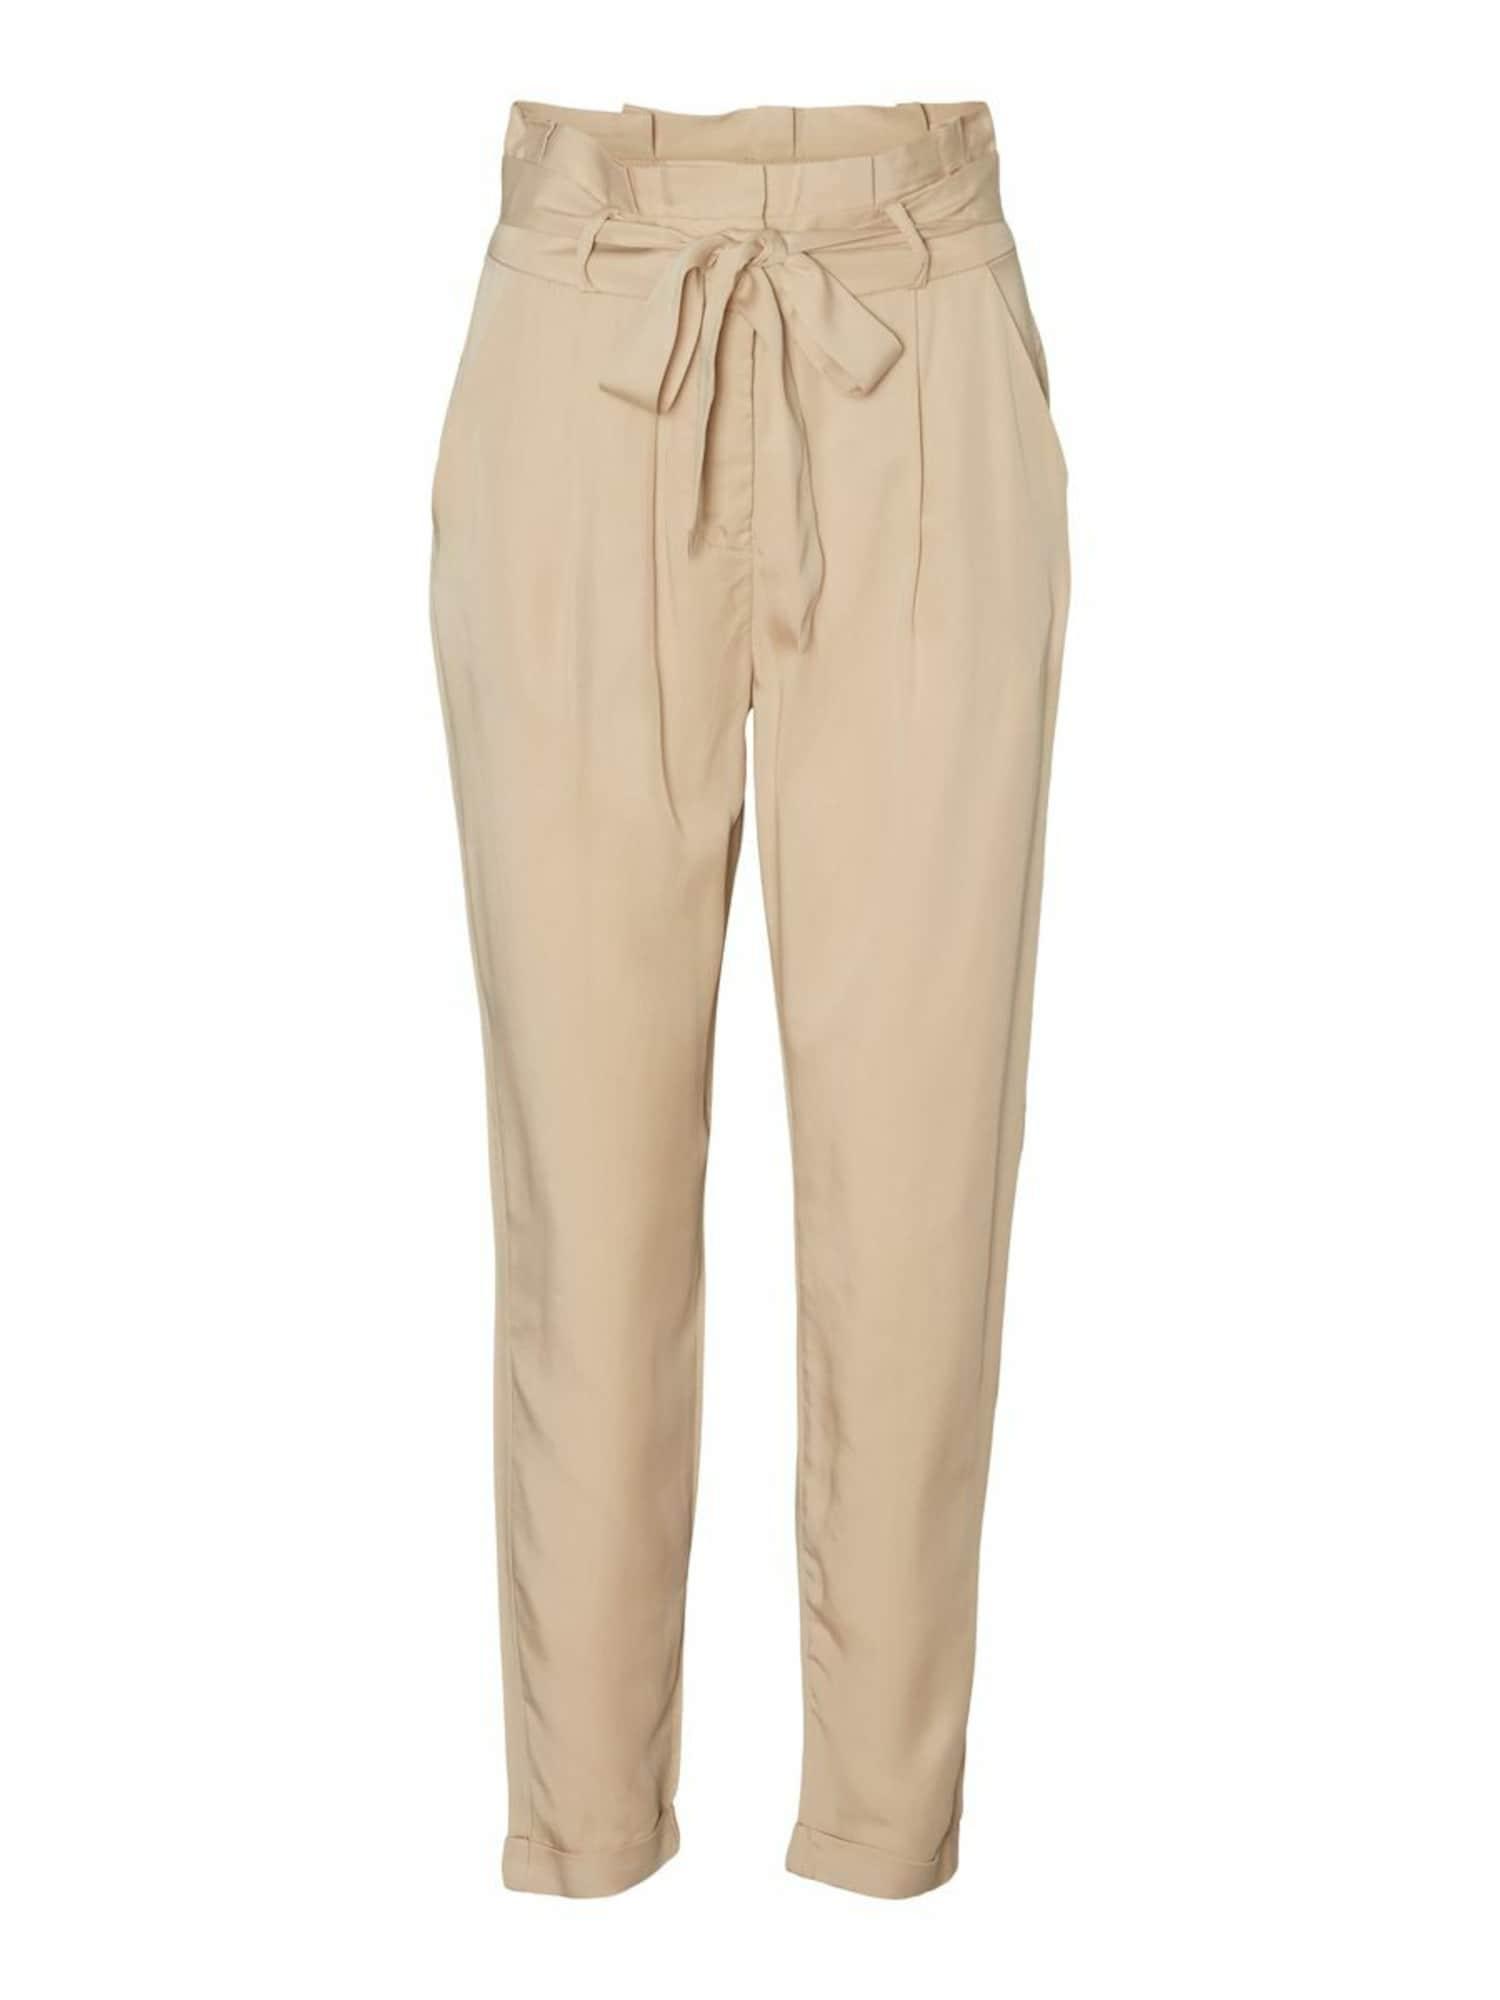 VERO MODA Pantalon à pince  - Beige - Taille: M - female